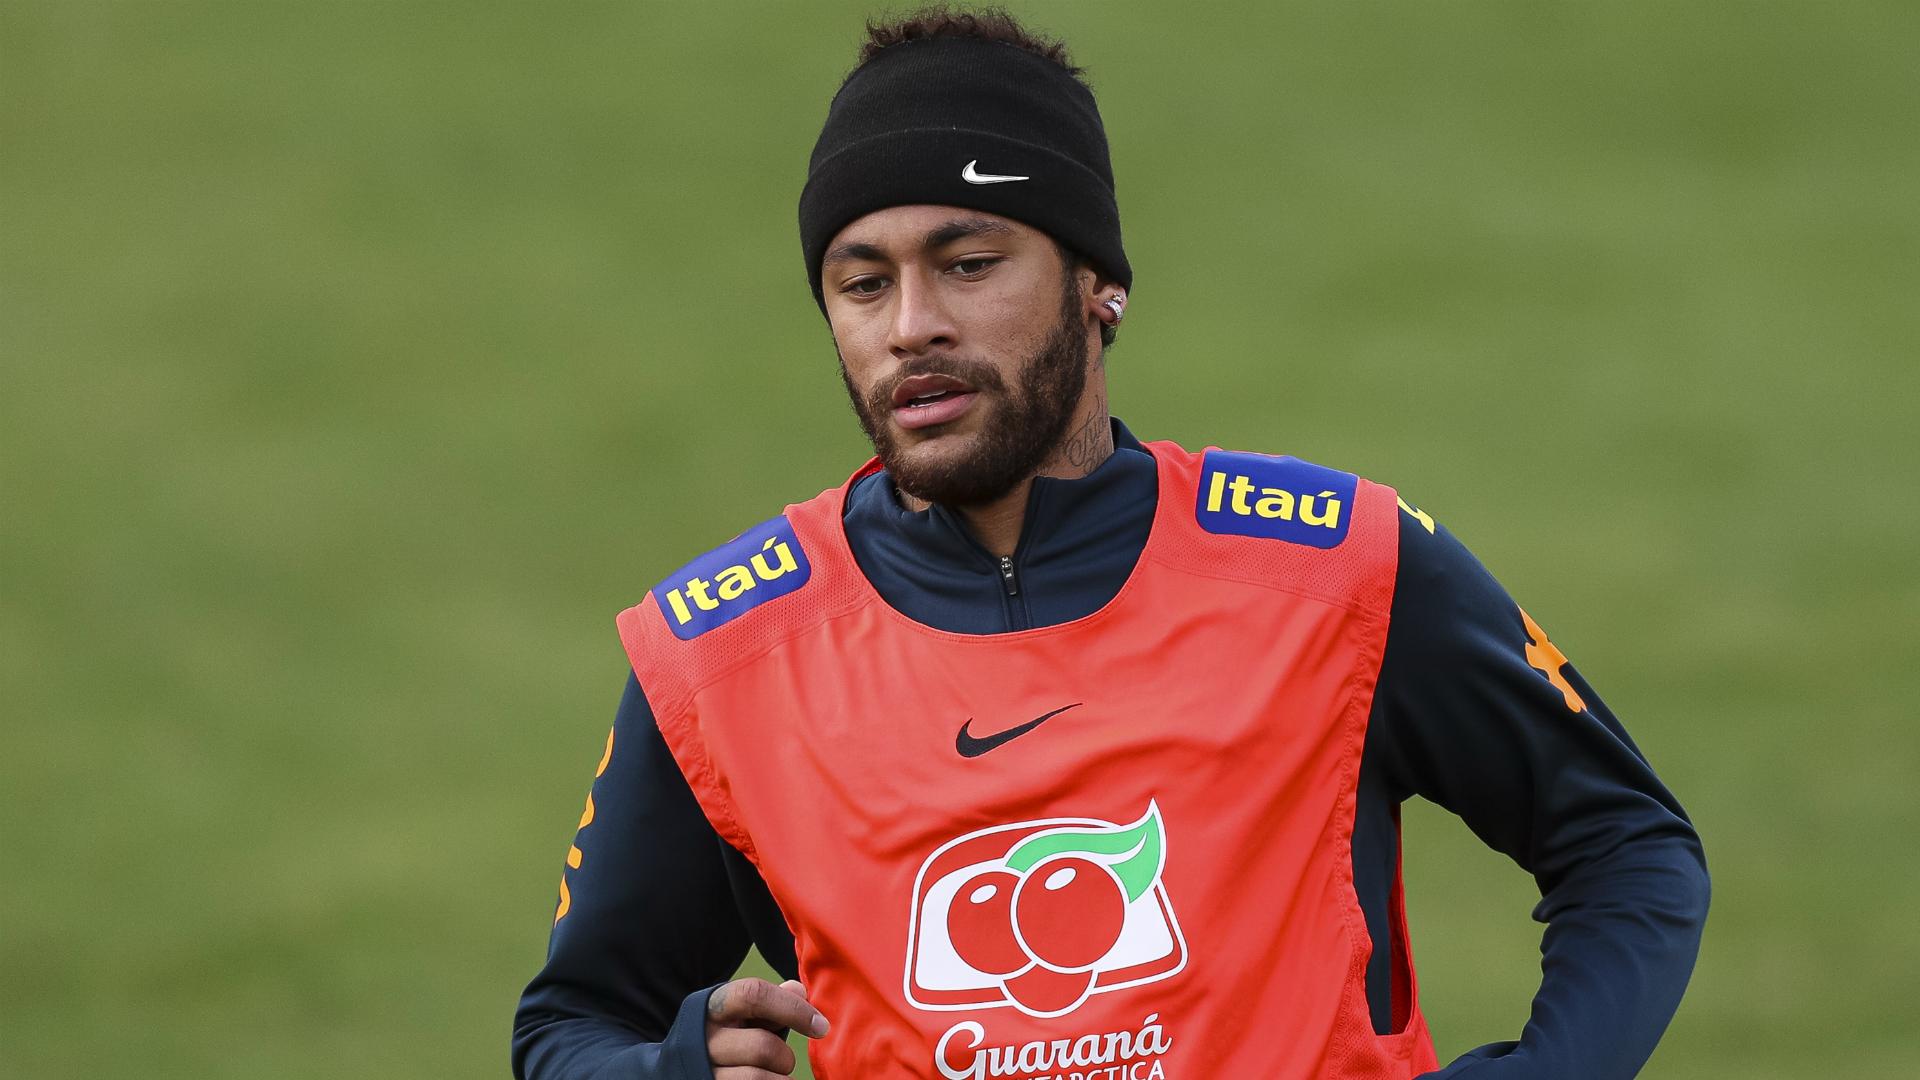 Neymar braced for toughest match of his career